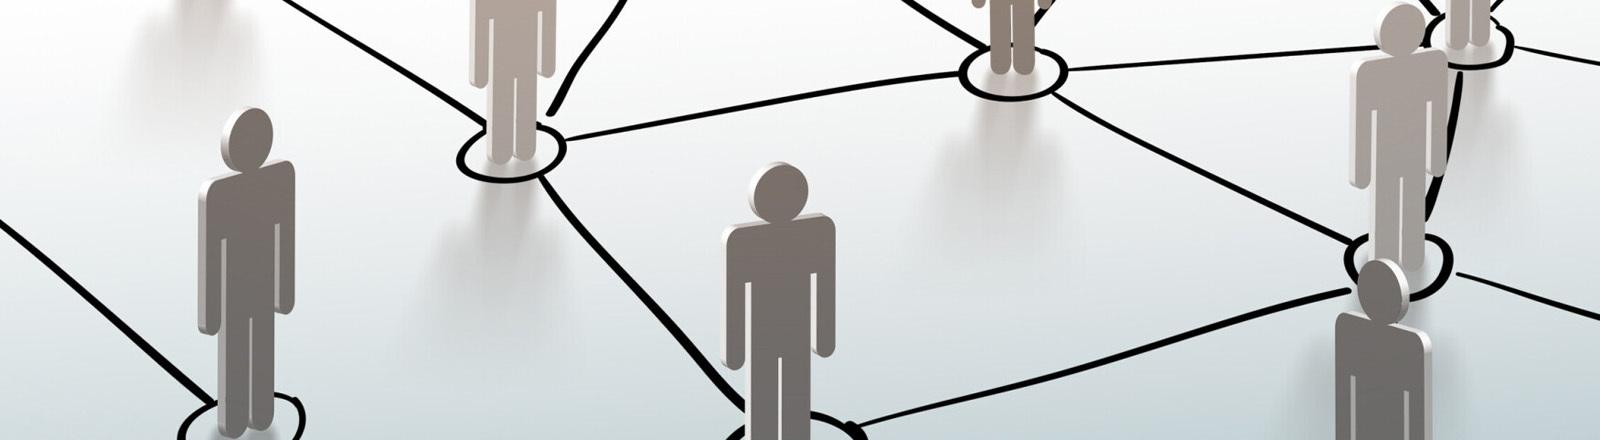 Symbolbild: Netzwerk